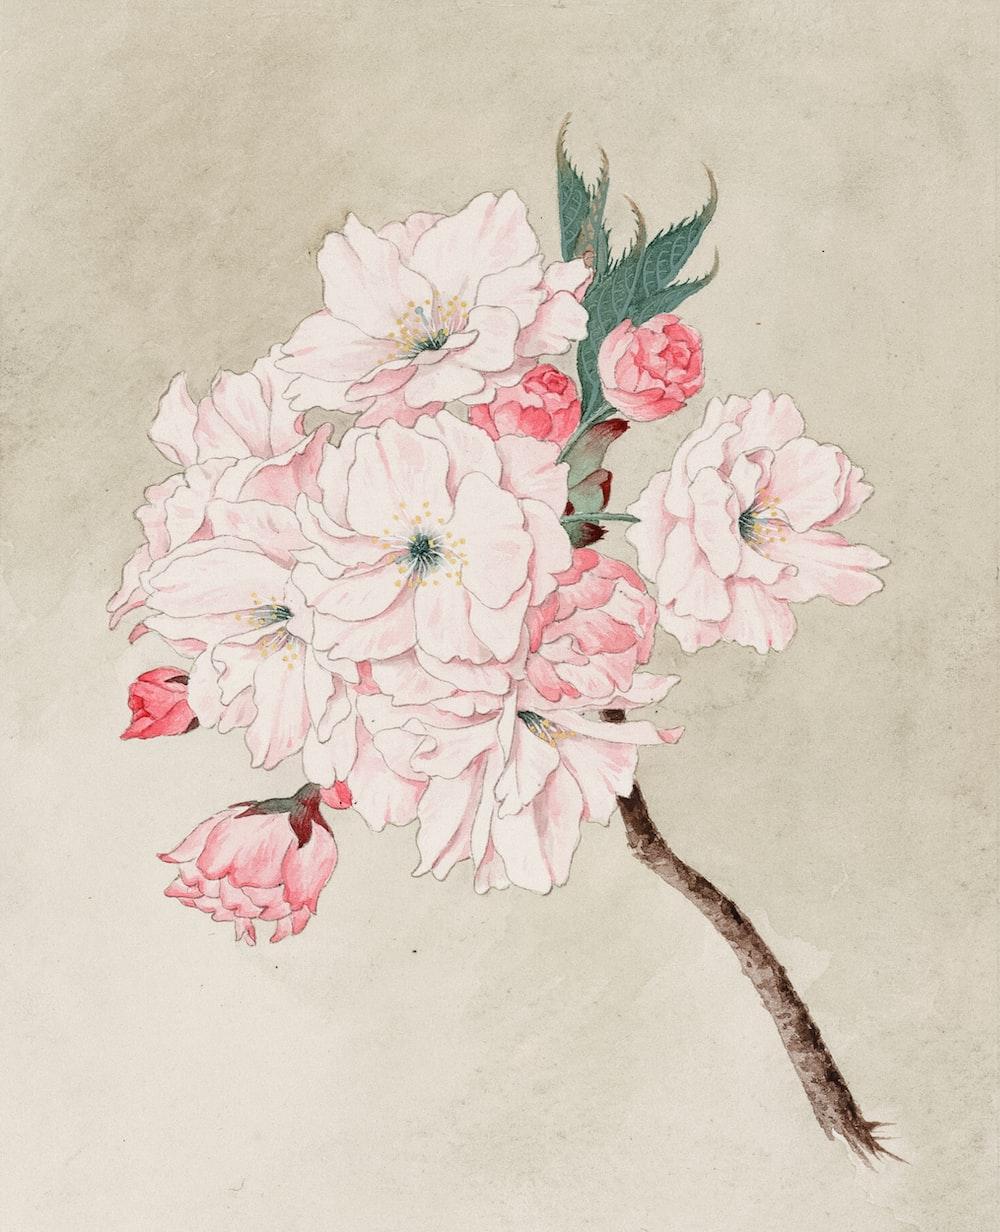 Watercolor of fukurokuju (god of longevity) cherry blossoms.